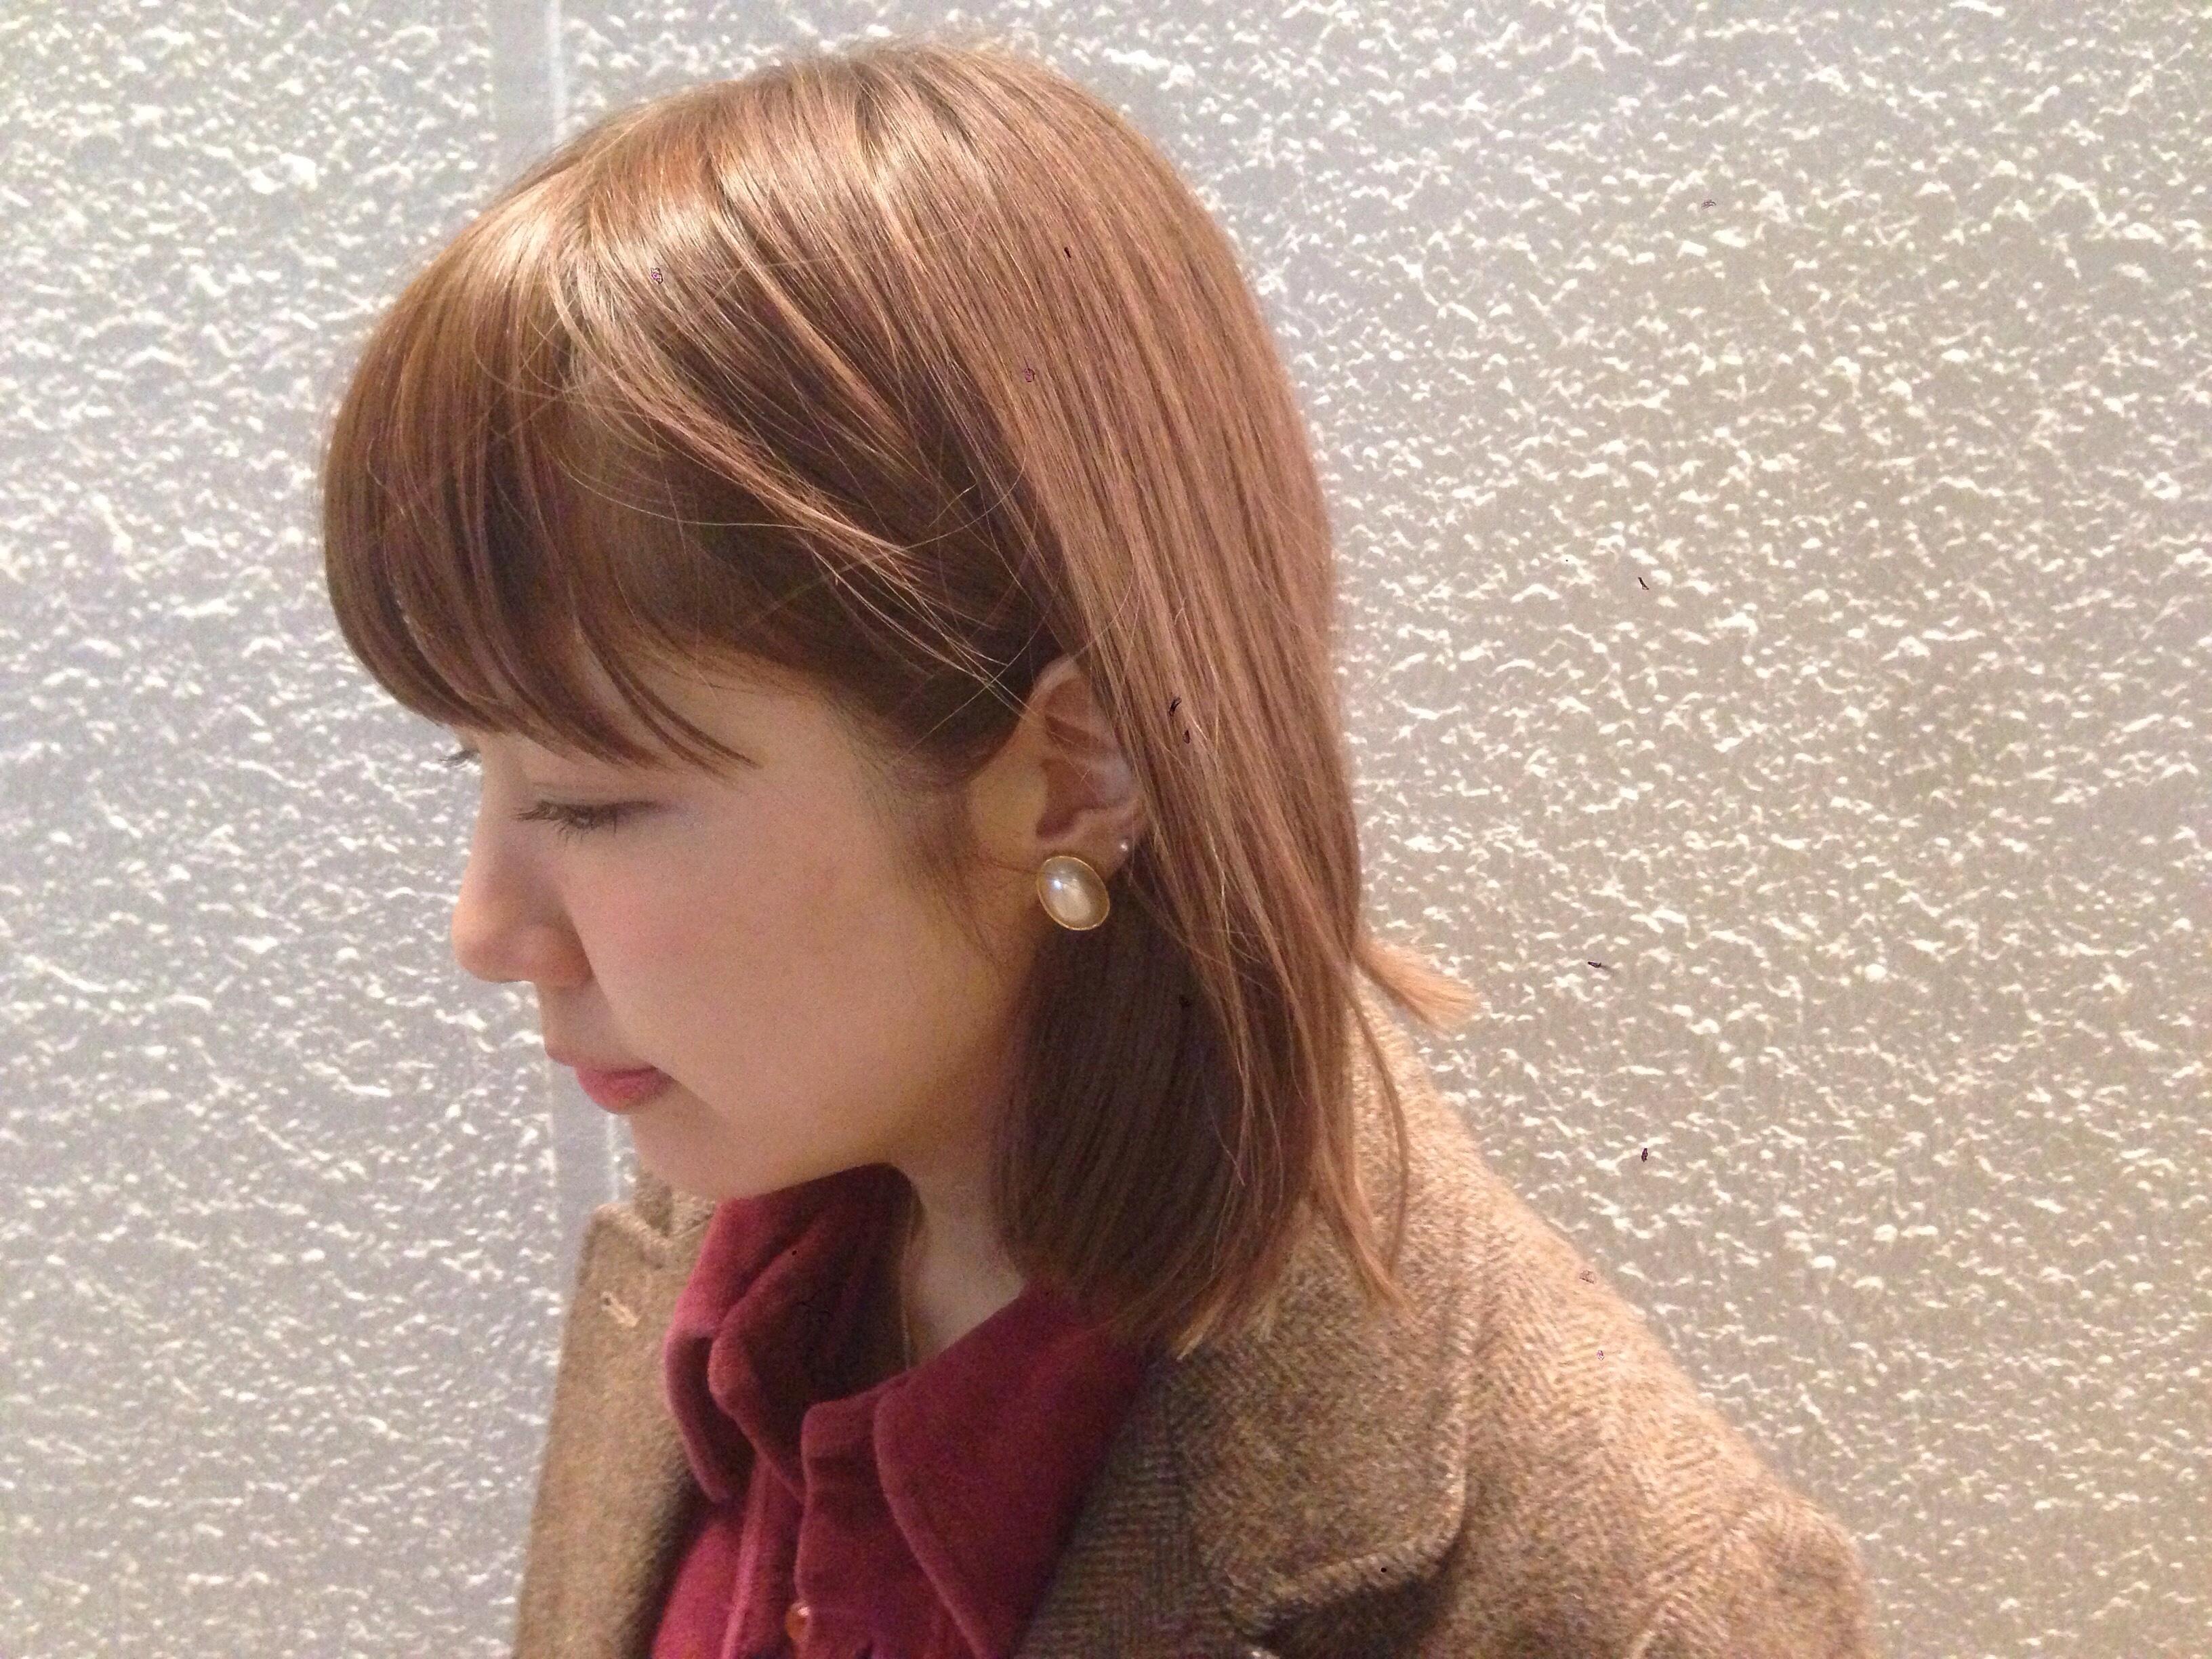 fc2blog_2016120511374913c.jpg